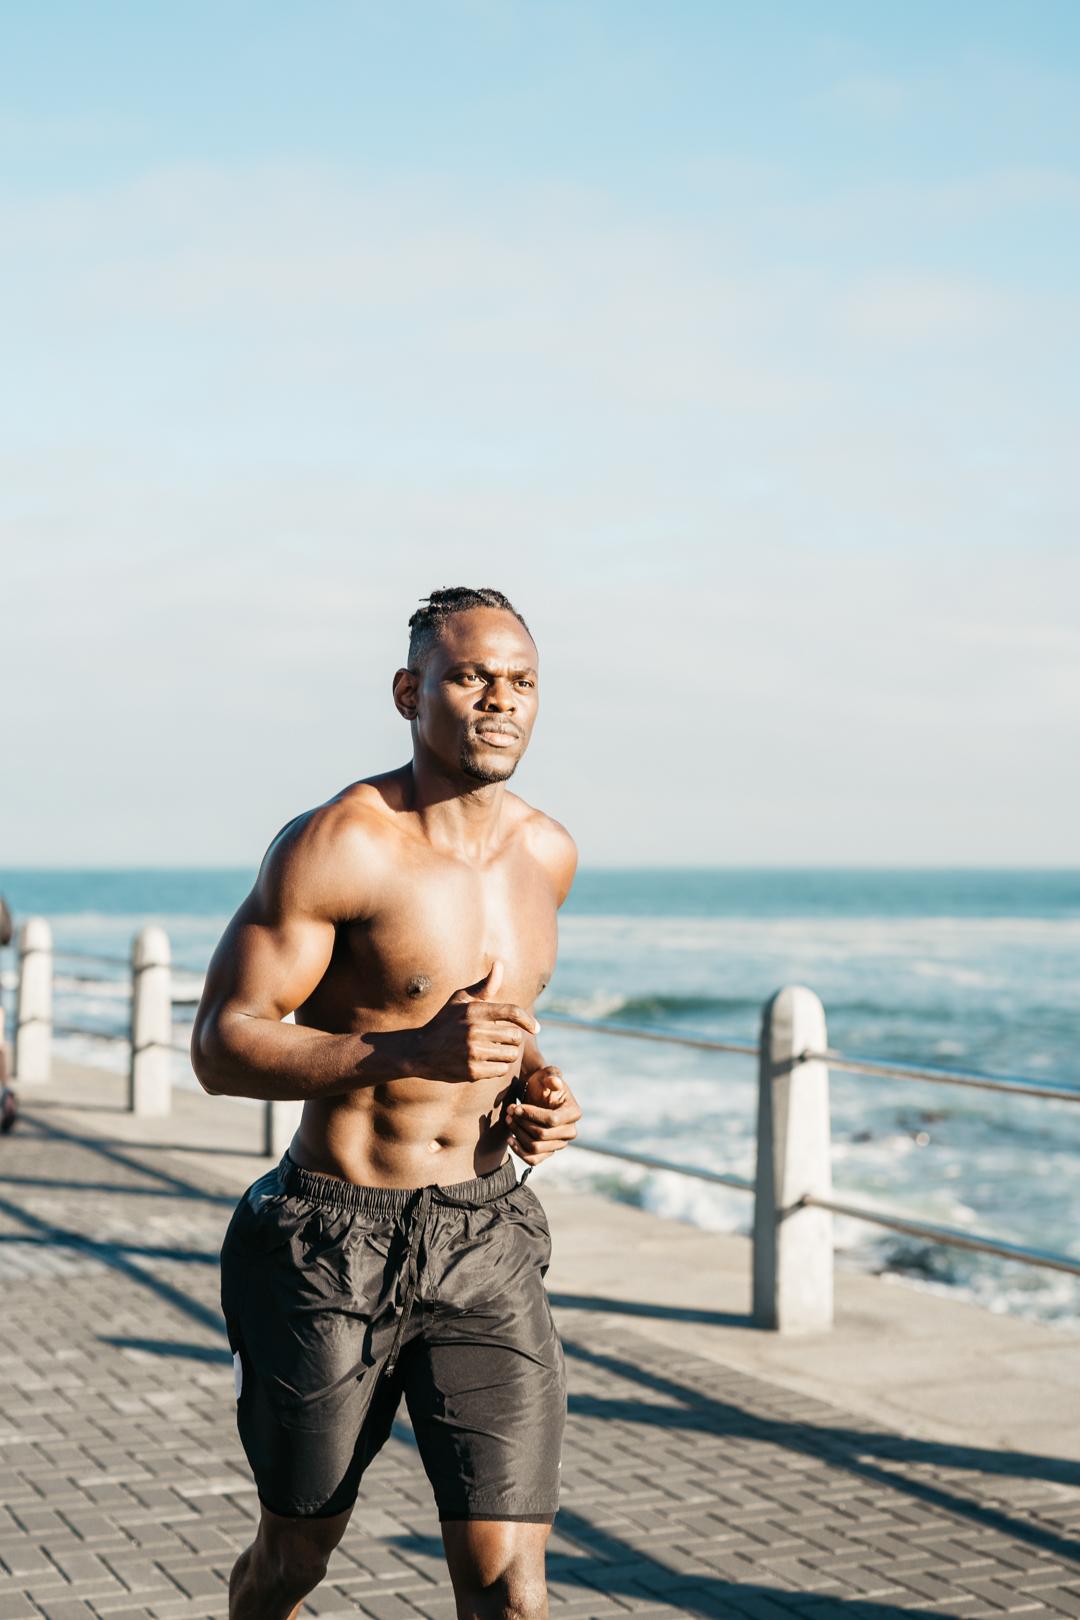 Fitness Portrait Photography Jose Bin - Cape Town Model - by Cape Image Co-44.jpg